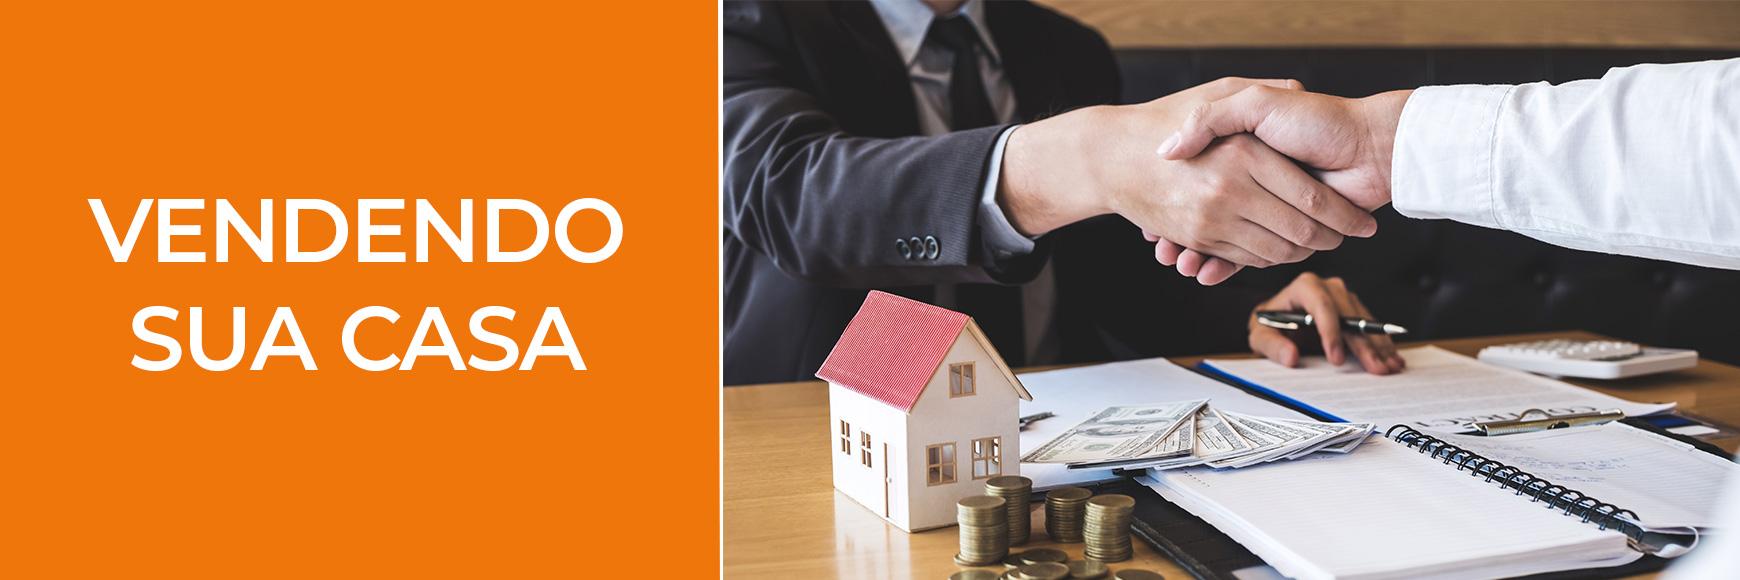 Vendendo sua casa Banner -Orlando Homes Sales